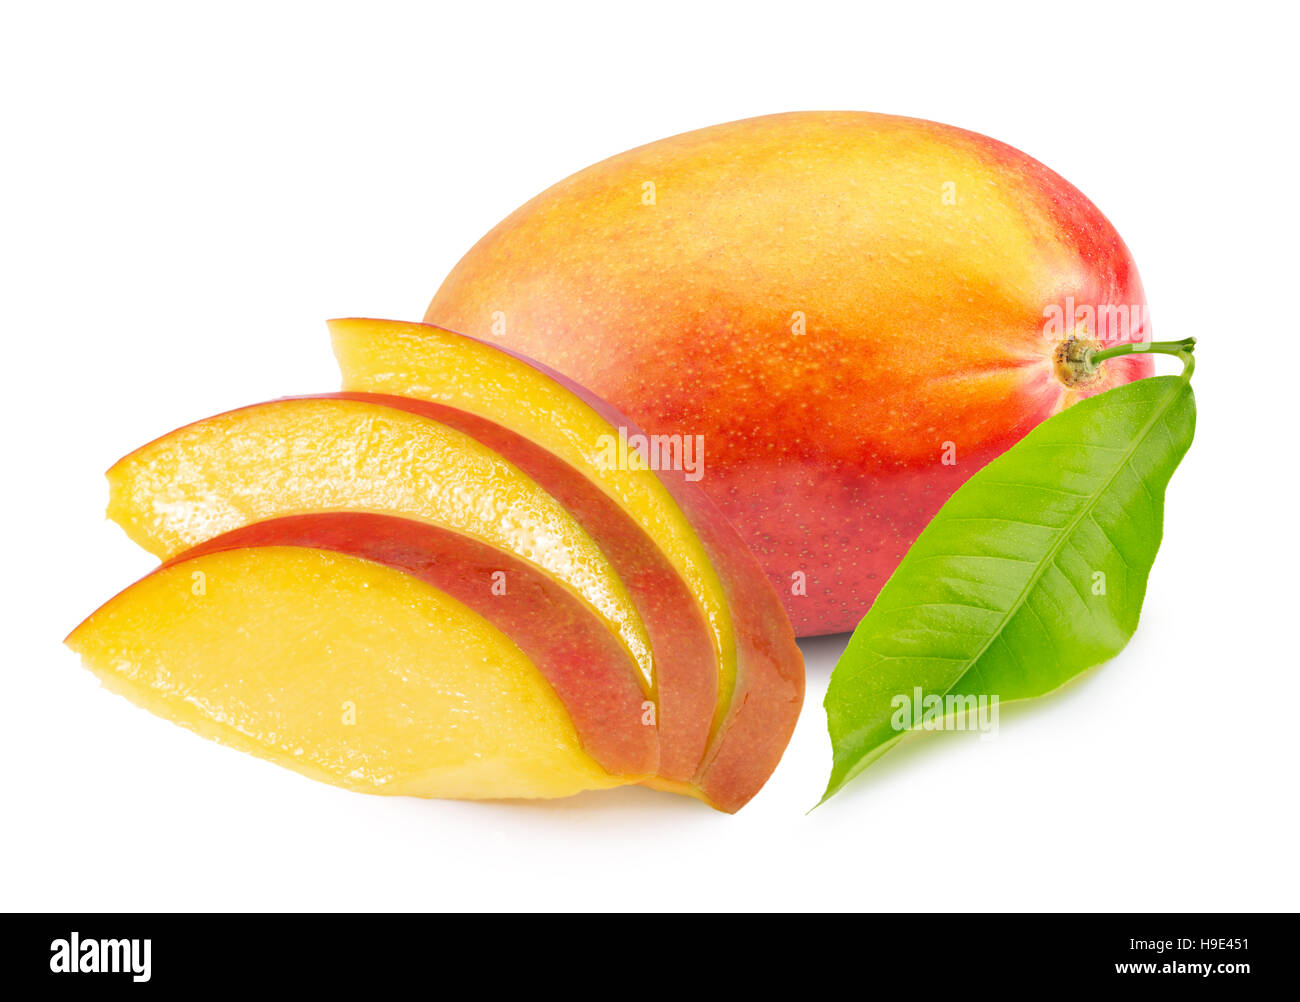 mango with slices isolated on the white background. - Stock Image